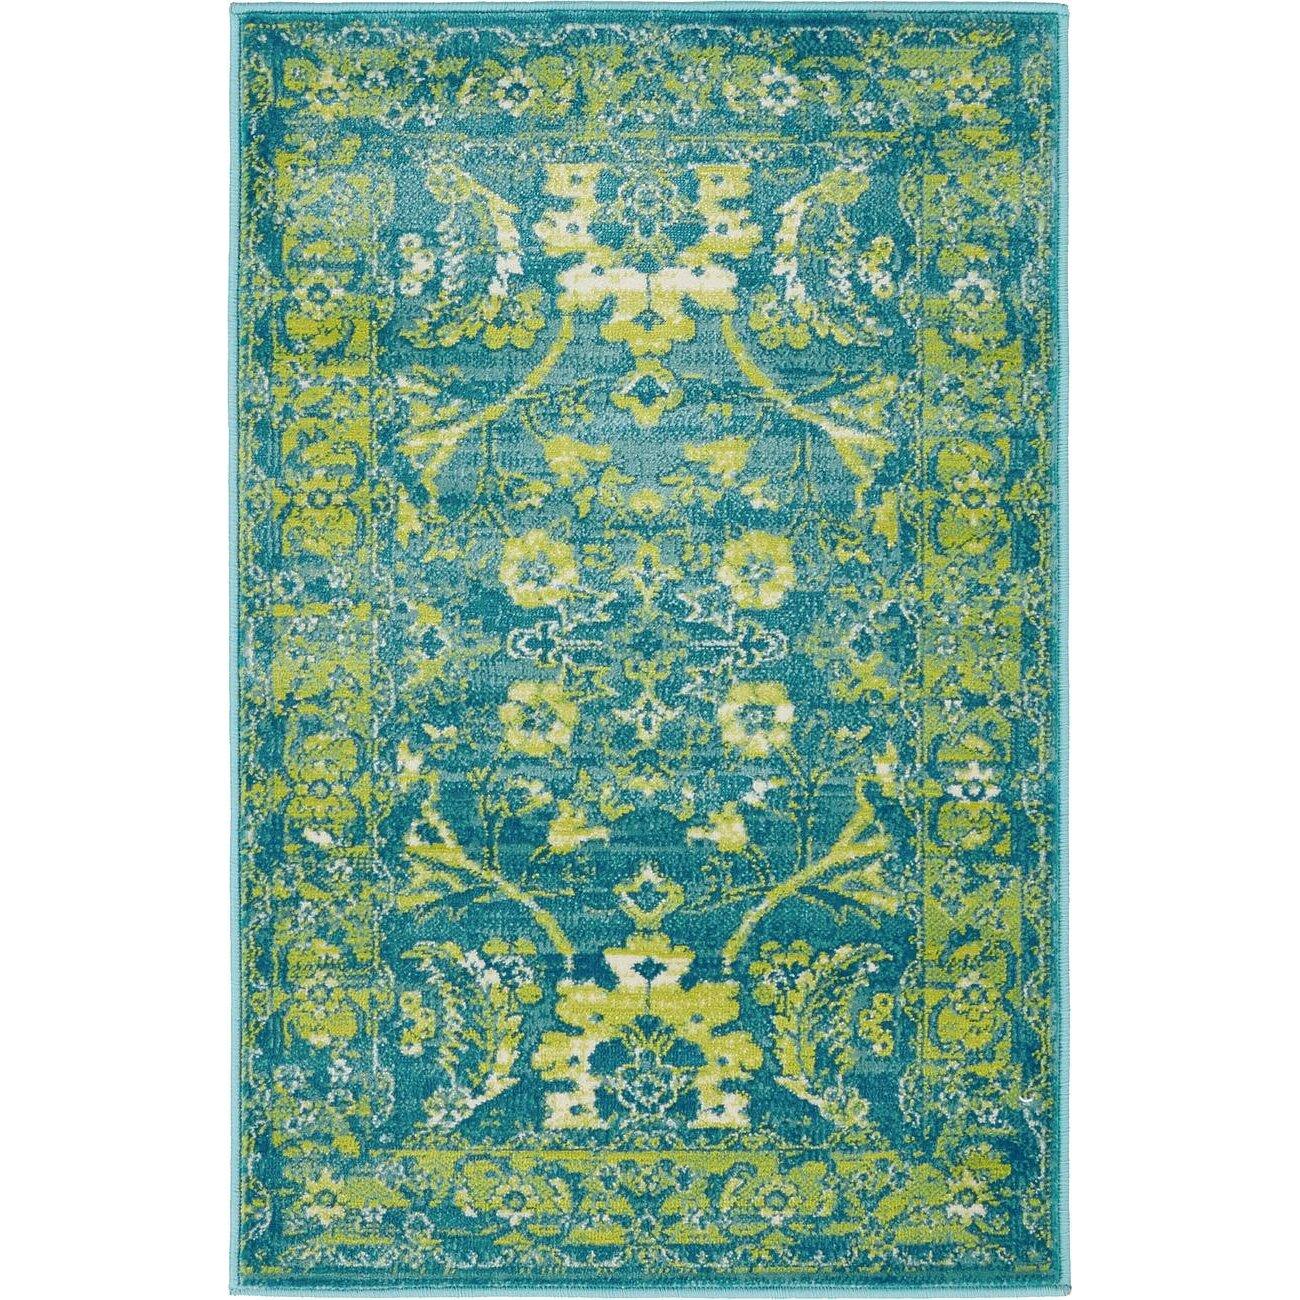 Bungalow Rose Yareli Blue/Green Area Rug & Reviews